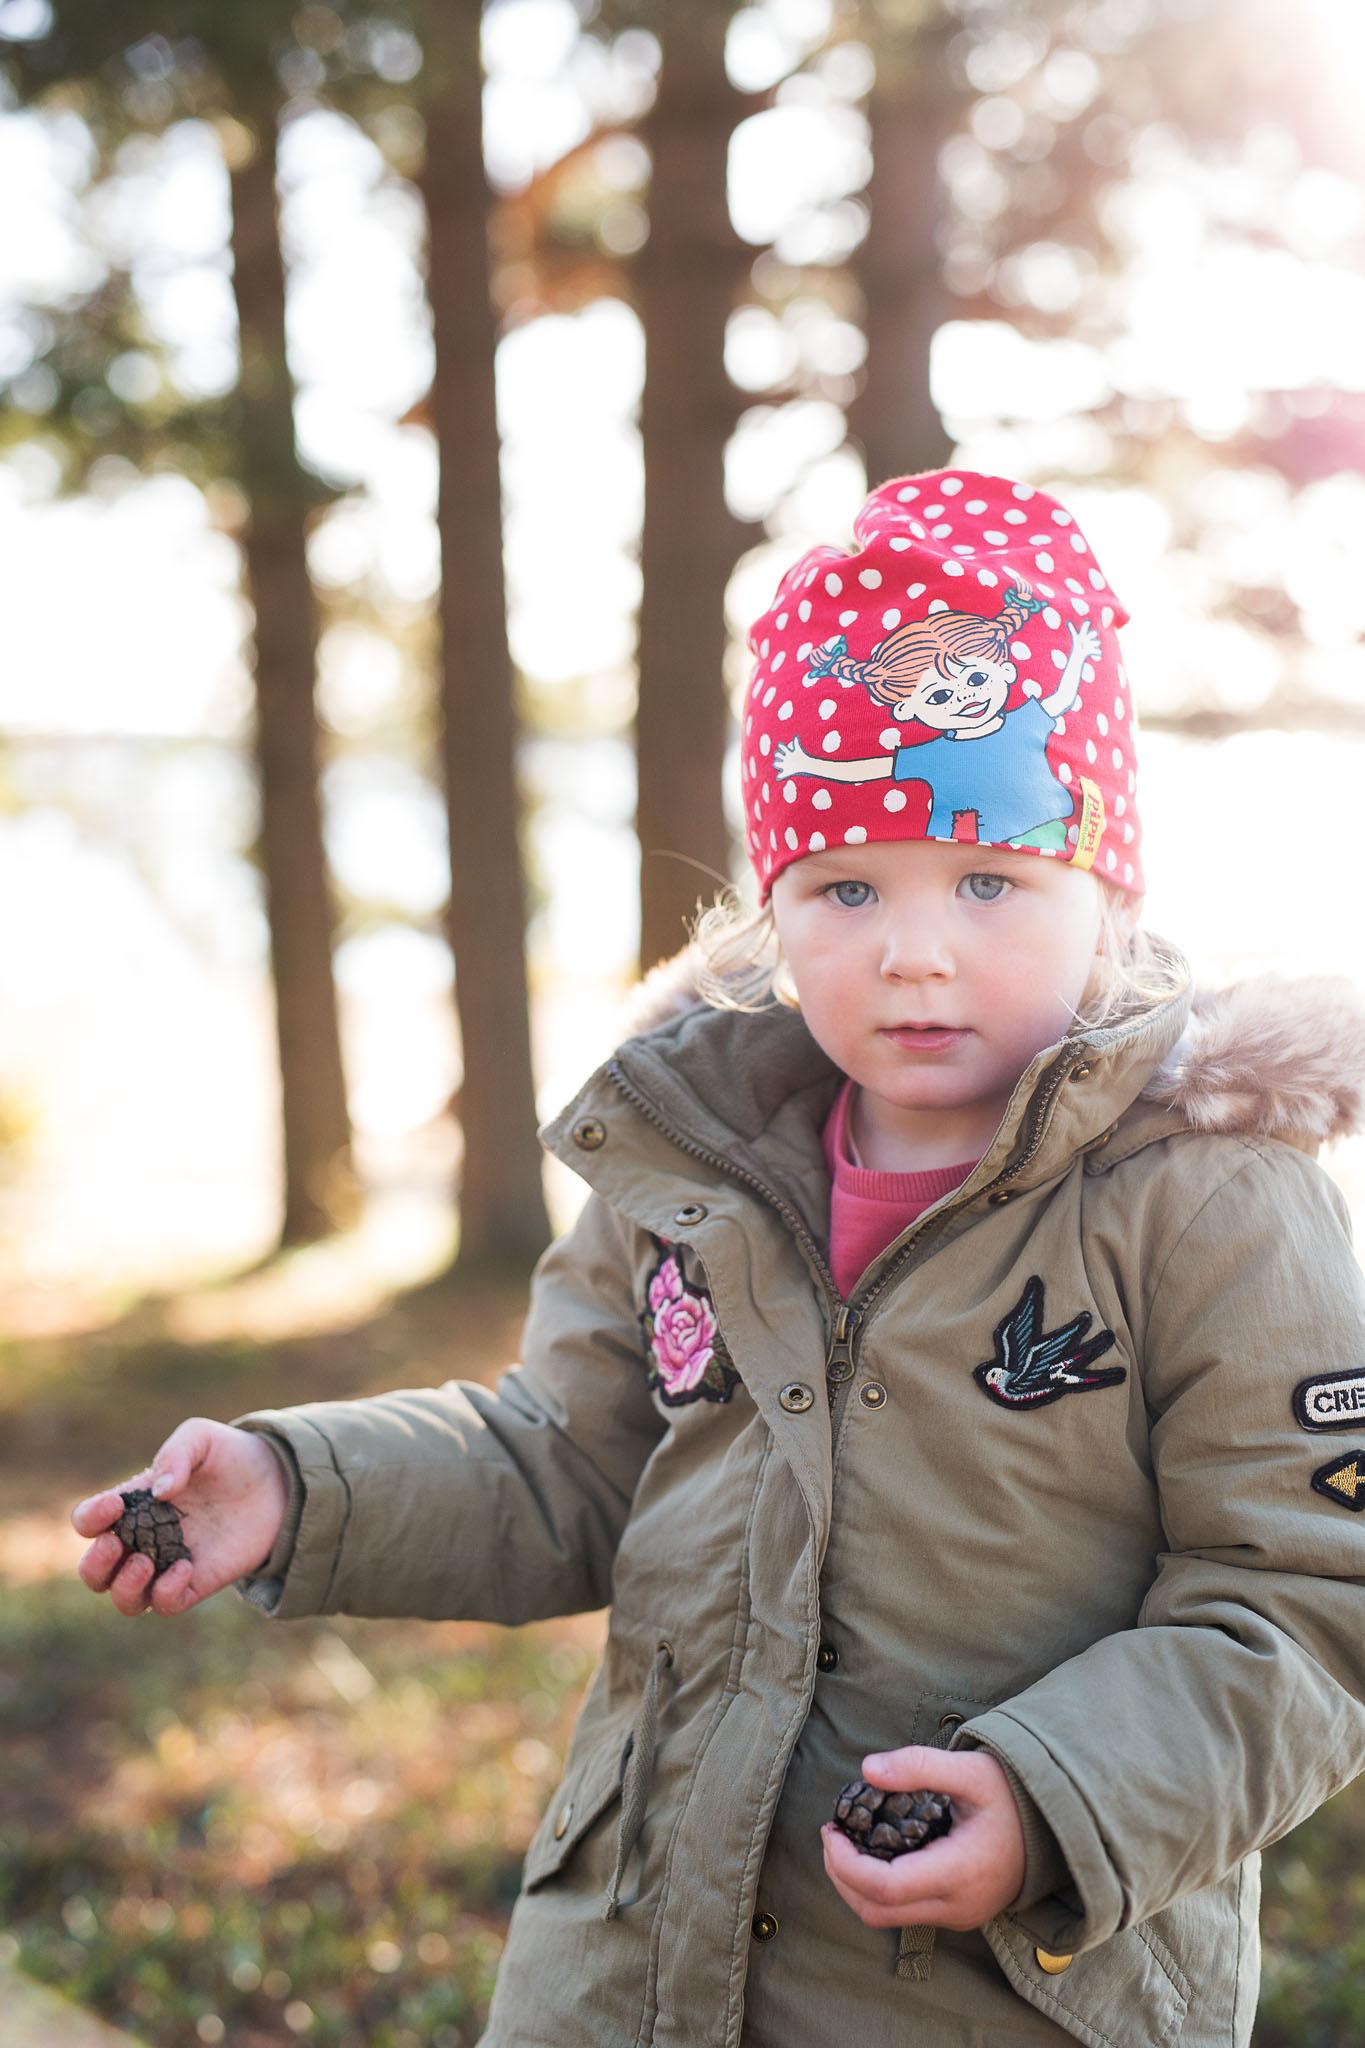 fotograf sabina wixner hudiksvall barn familj 5.jpg